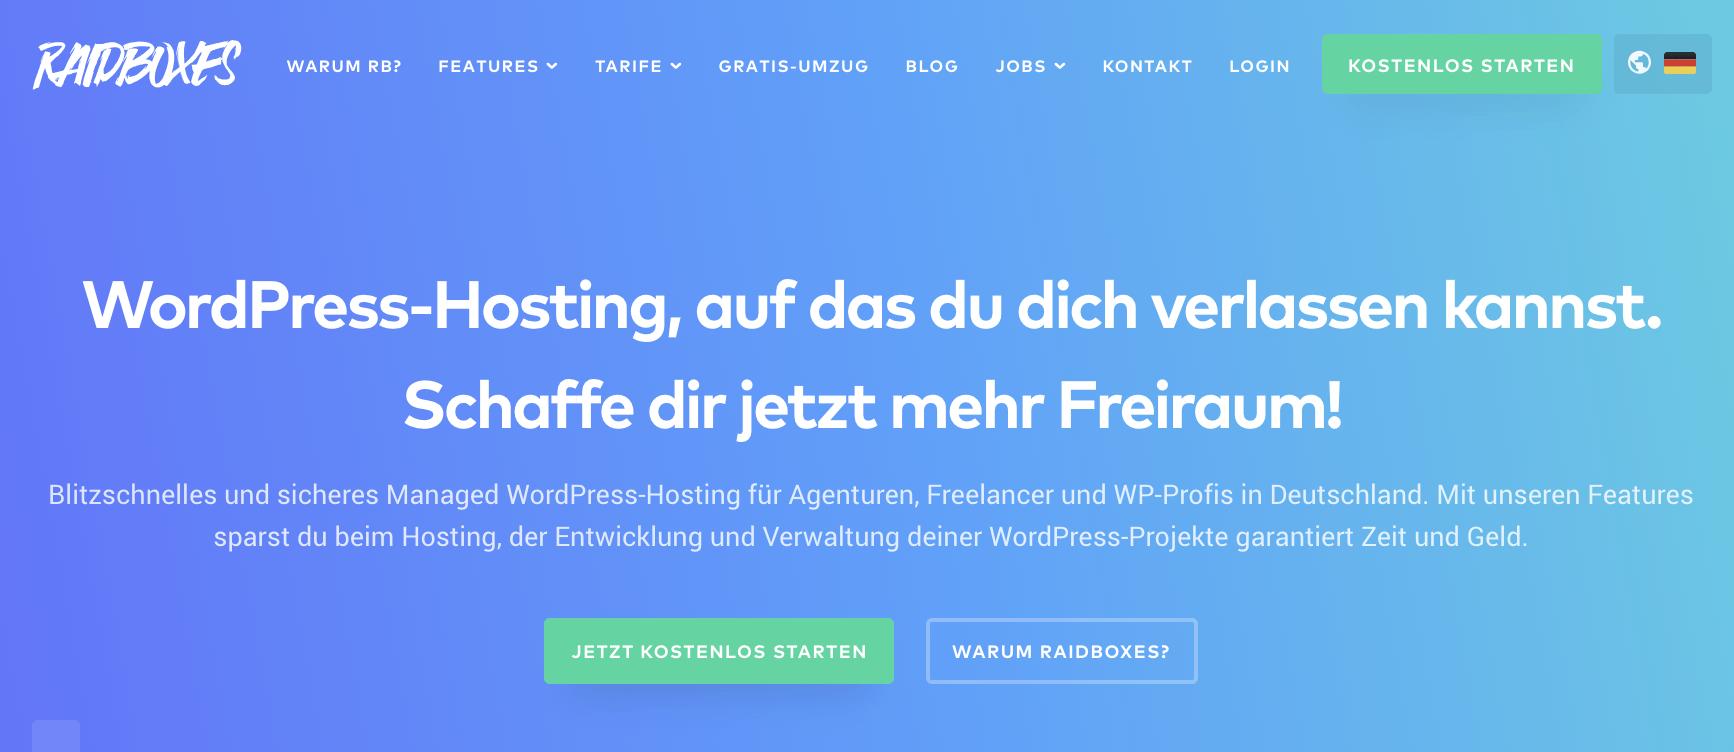 raidboxes managed WordPress-Hosting